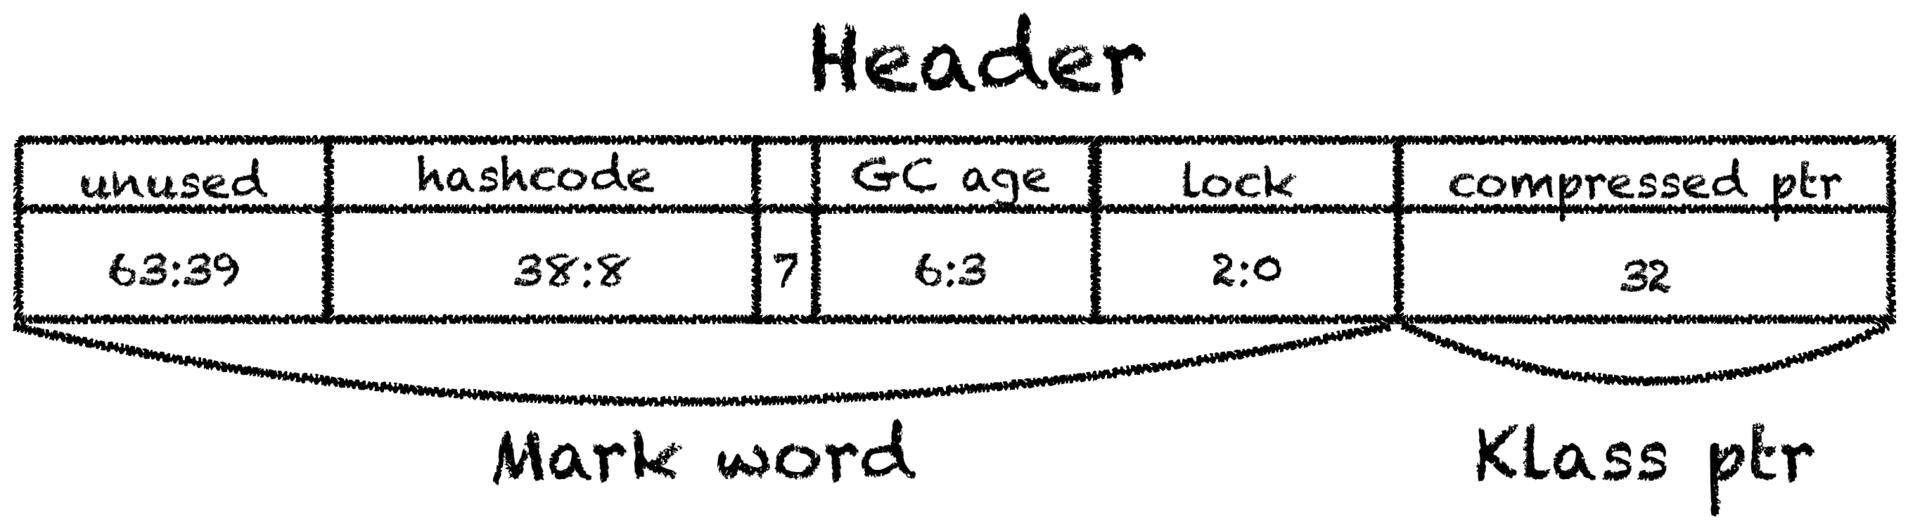 Как JVM аллоцирует объекты? - 7